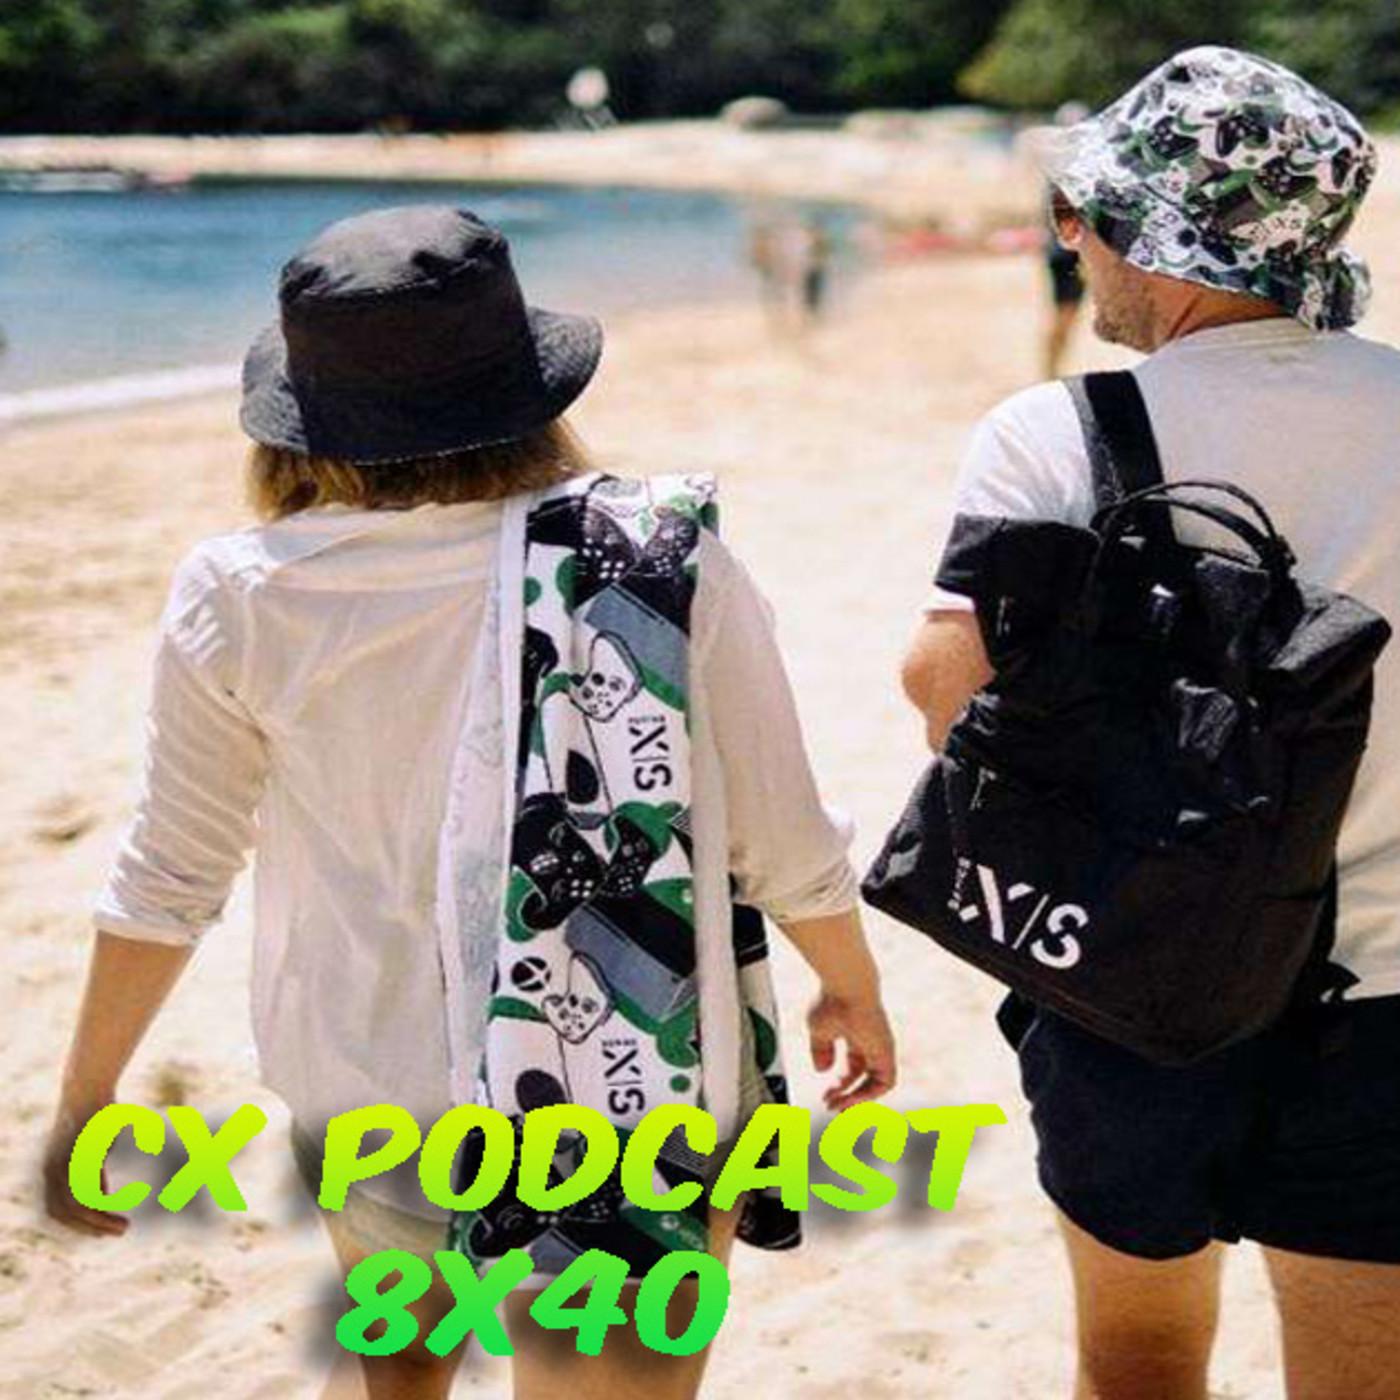 CX Podcast 8x40 I Programa off-topic final de temporada